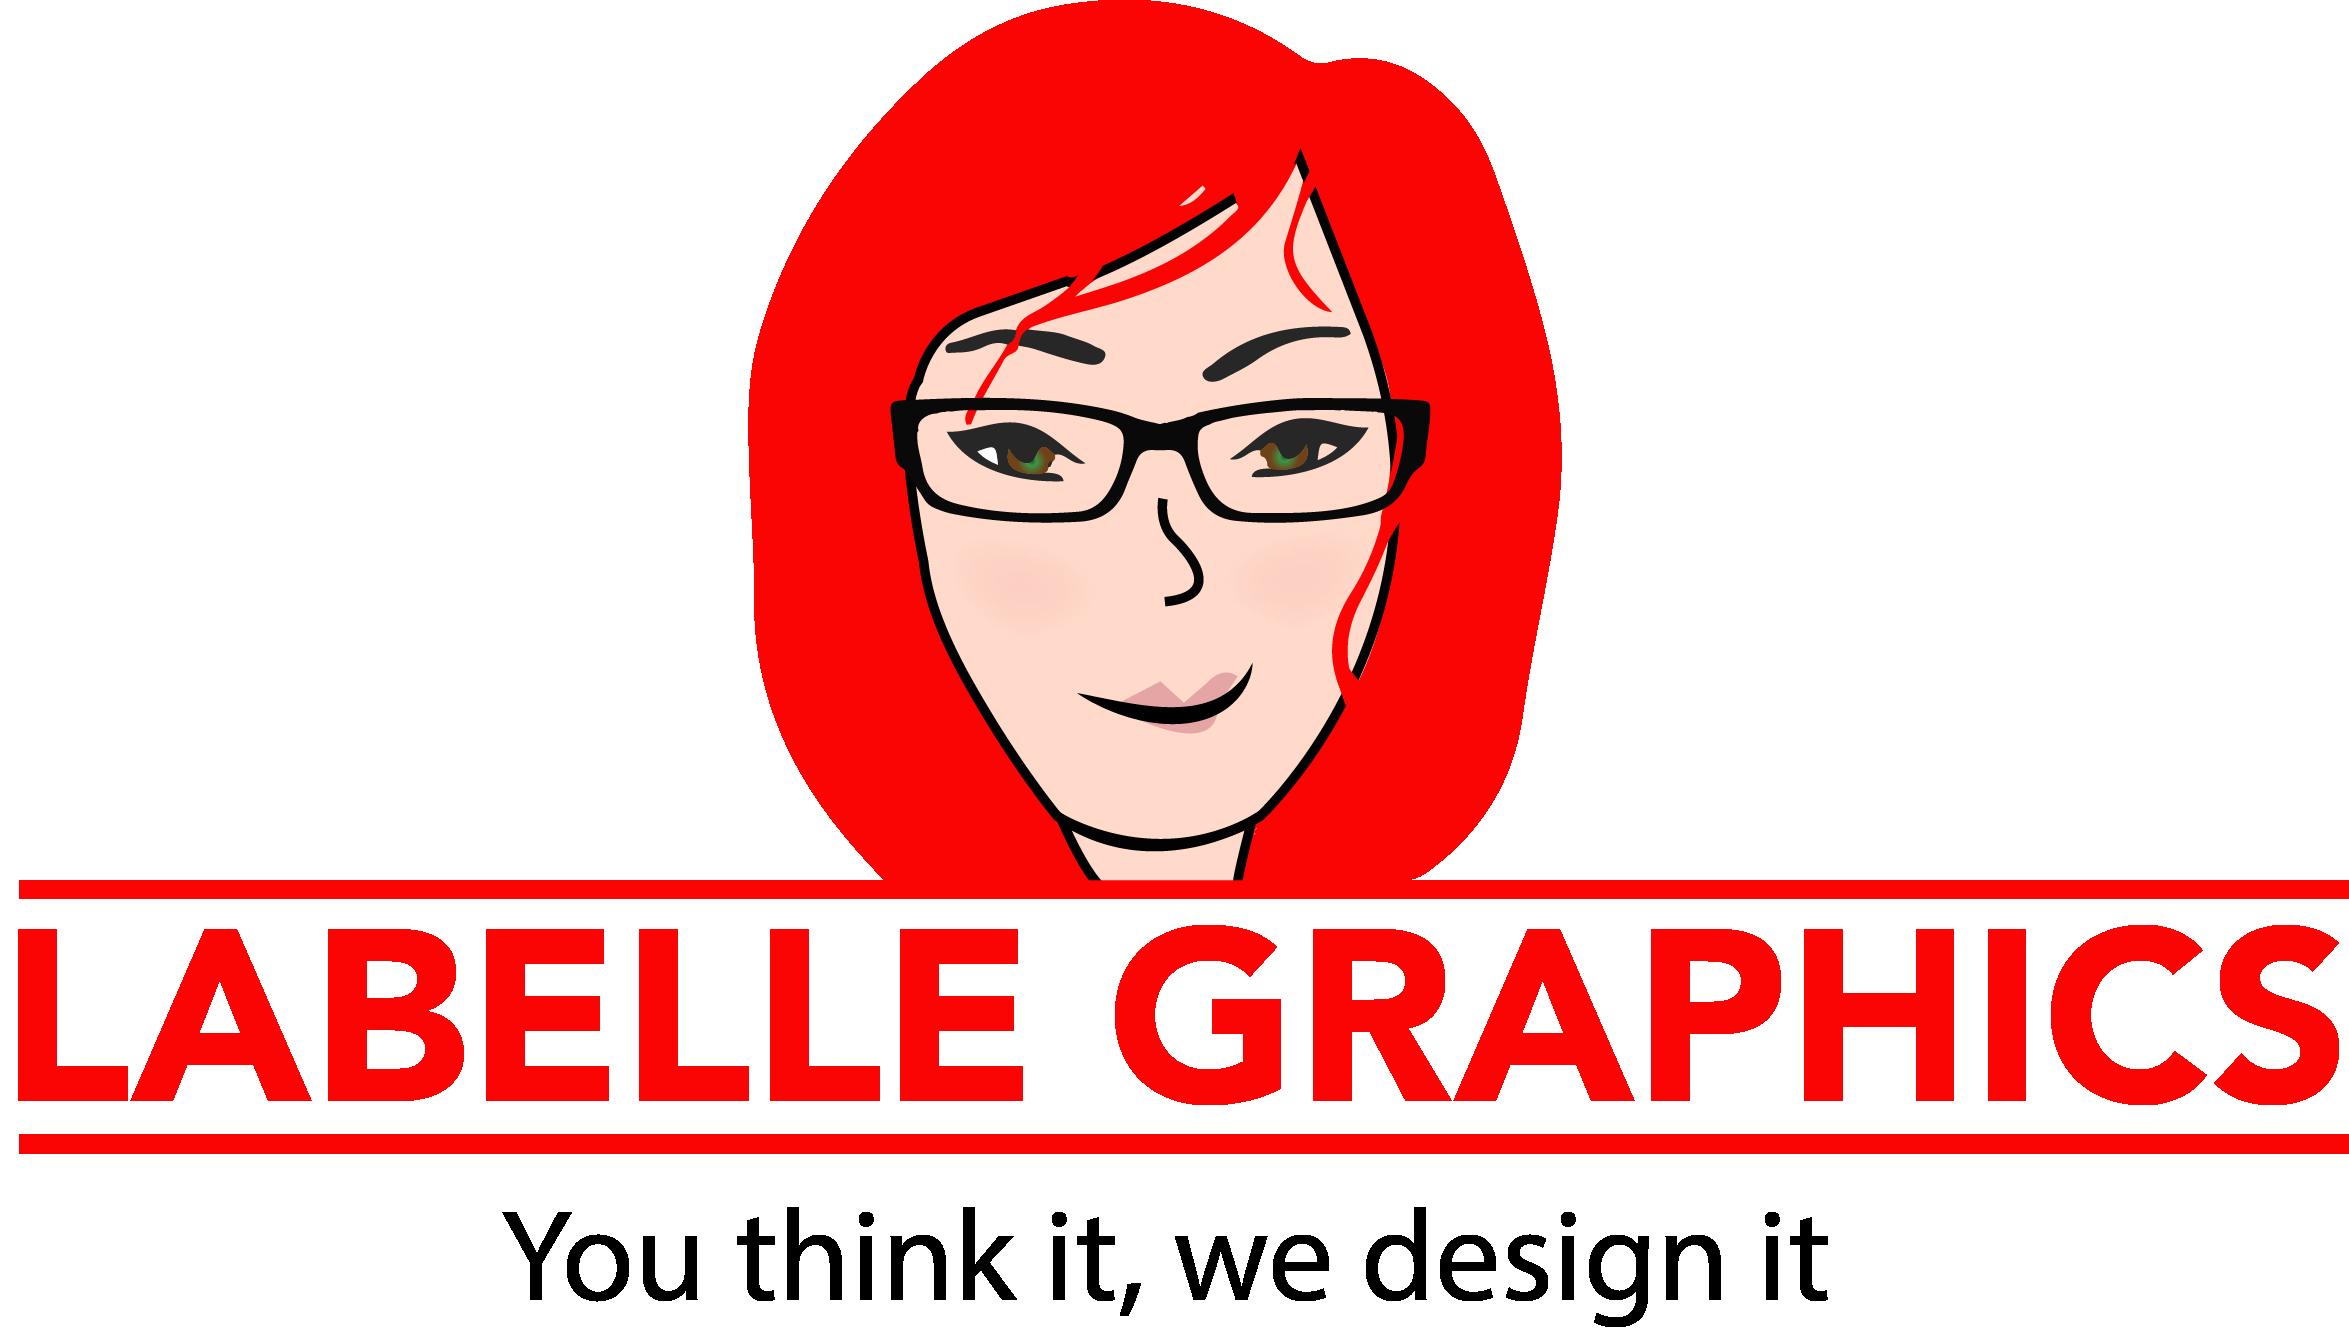 LaBelle Graphics